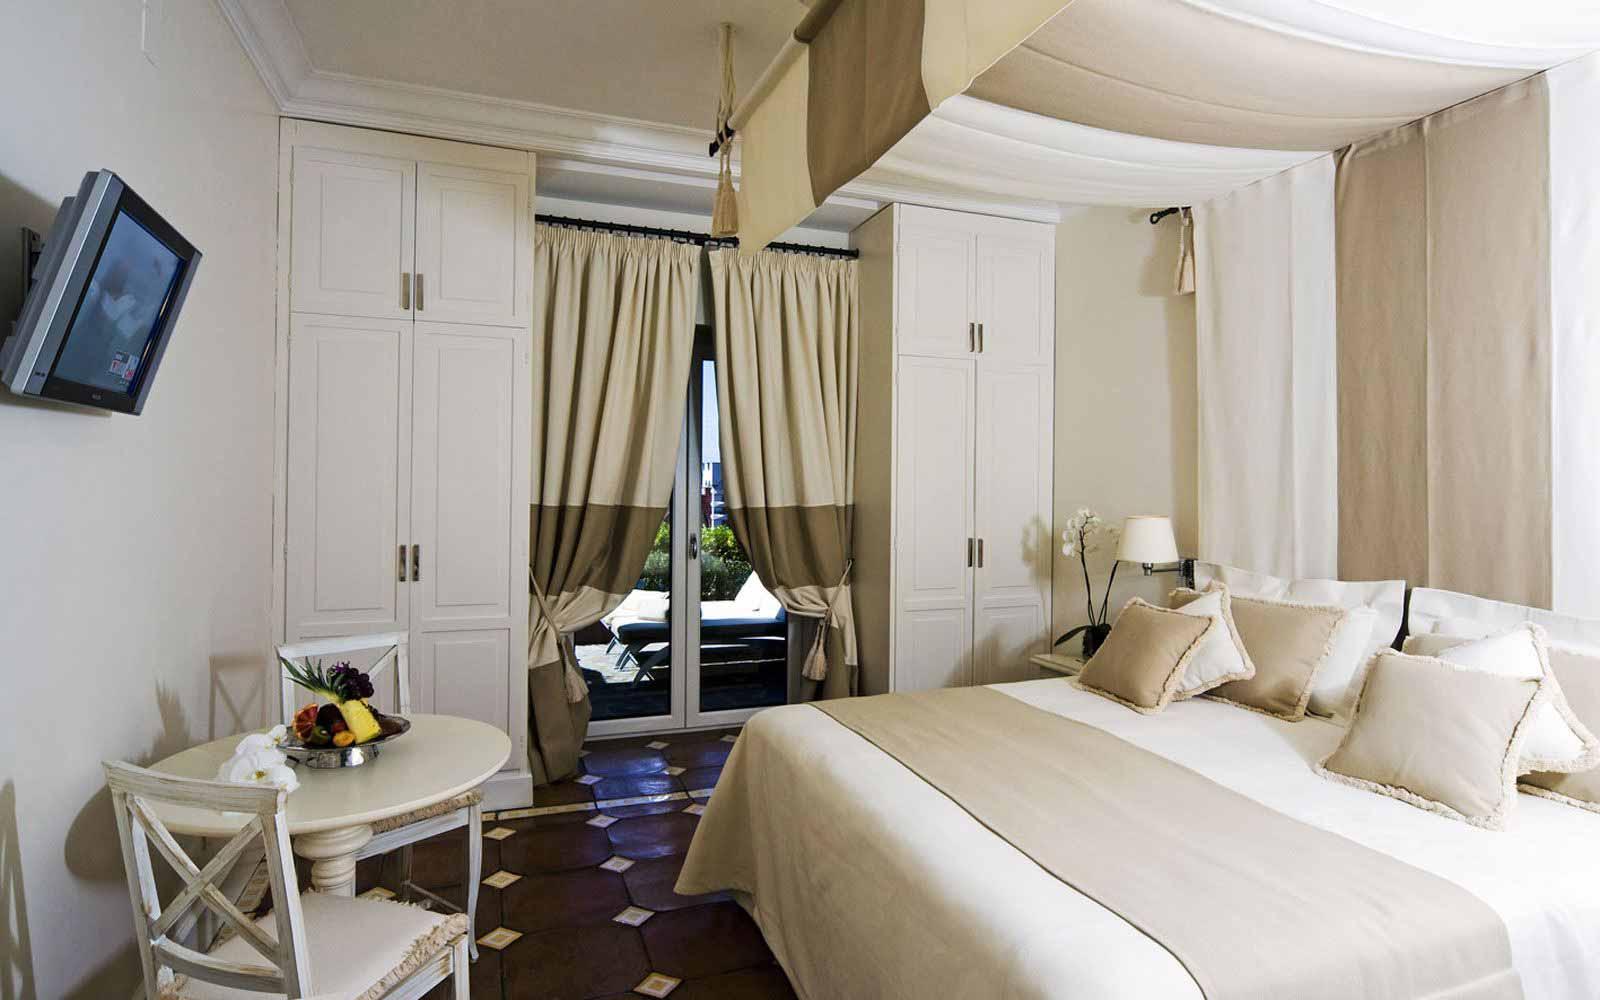 Standard Room at Mezzatorre Resort & Spa